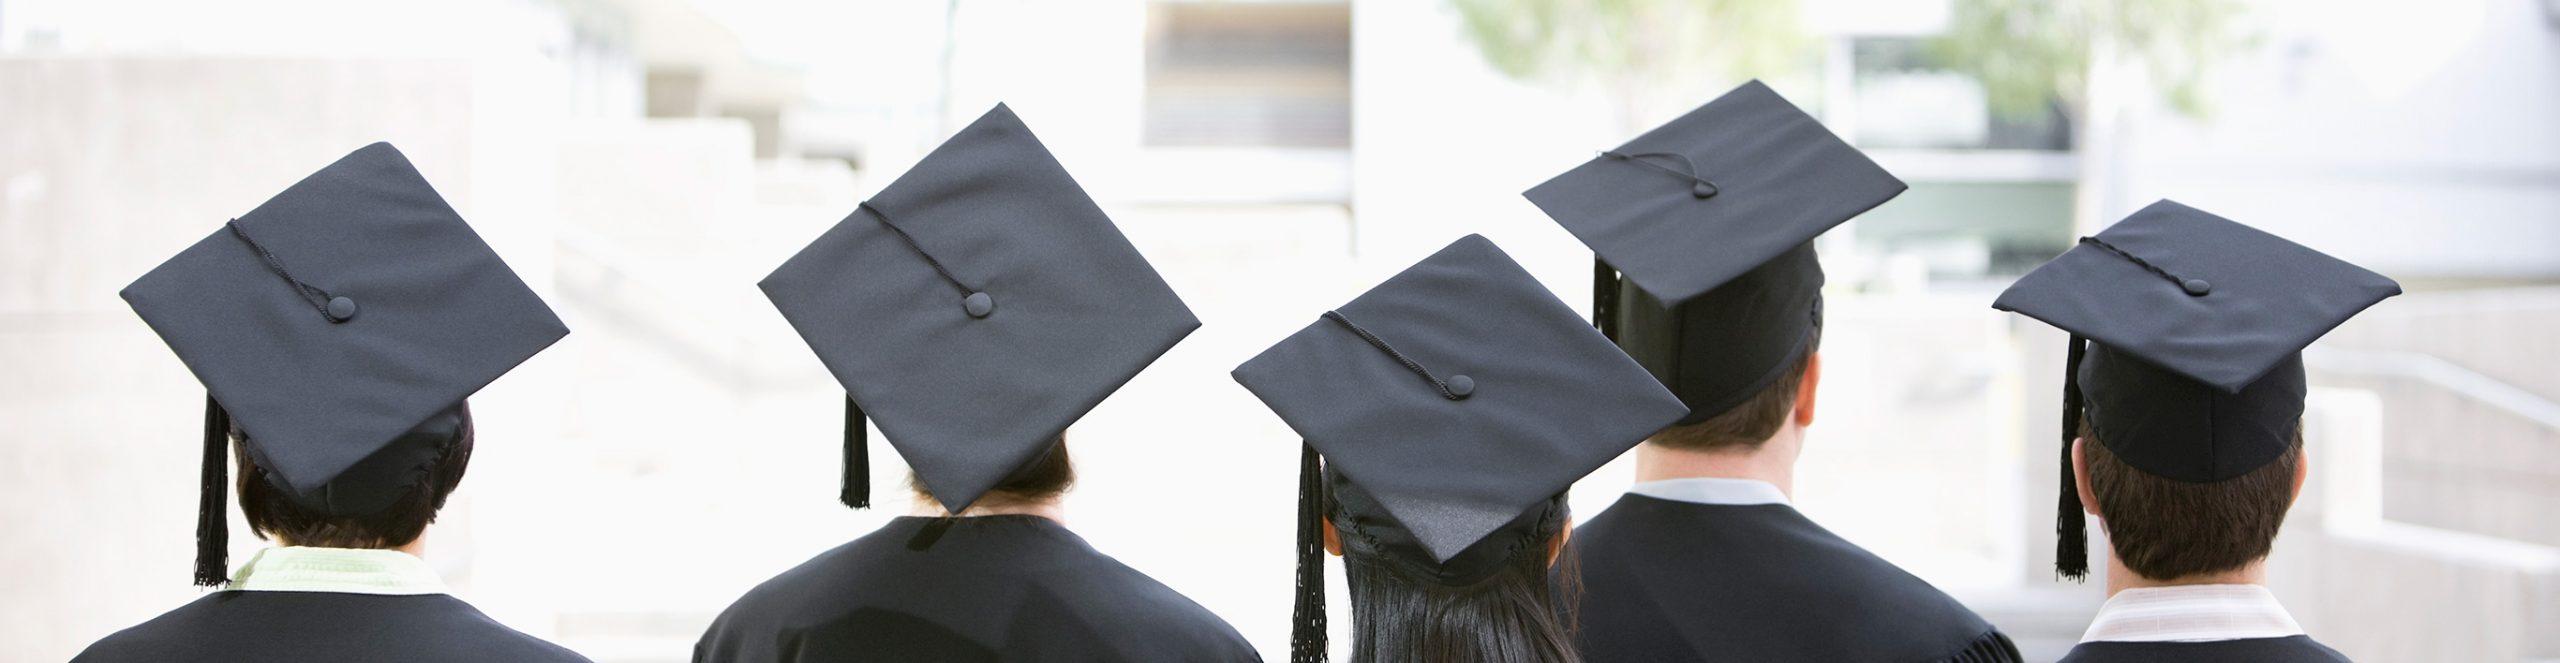 kofc-scholarships2x